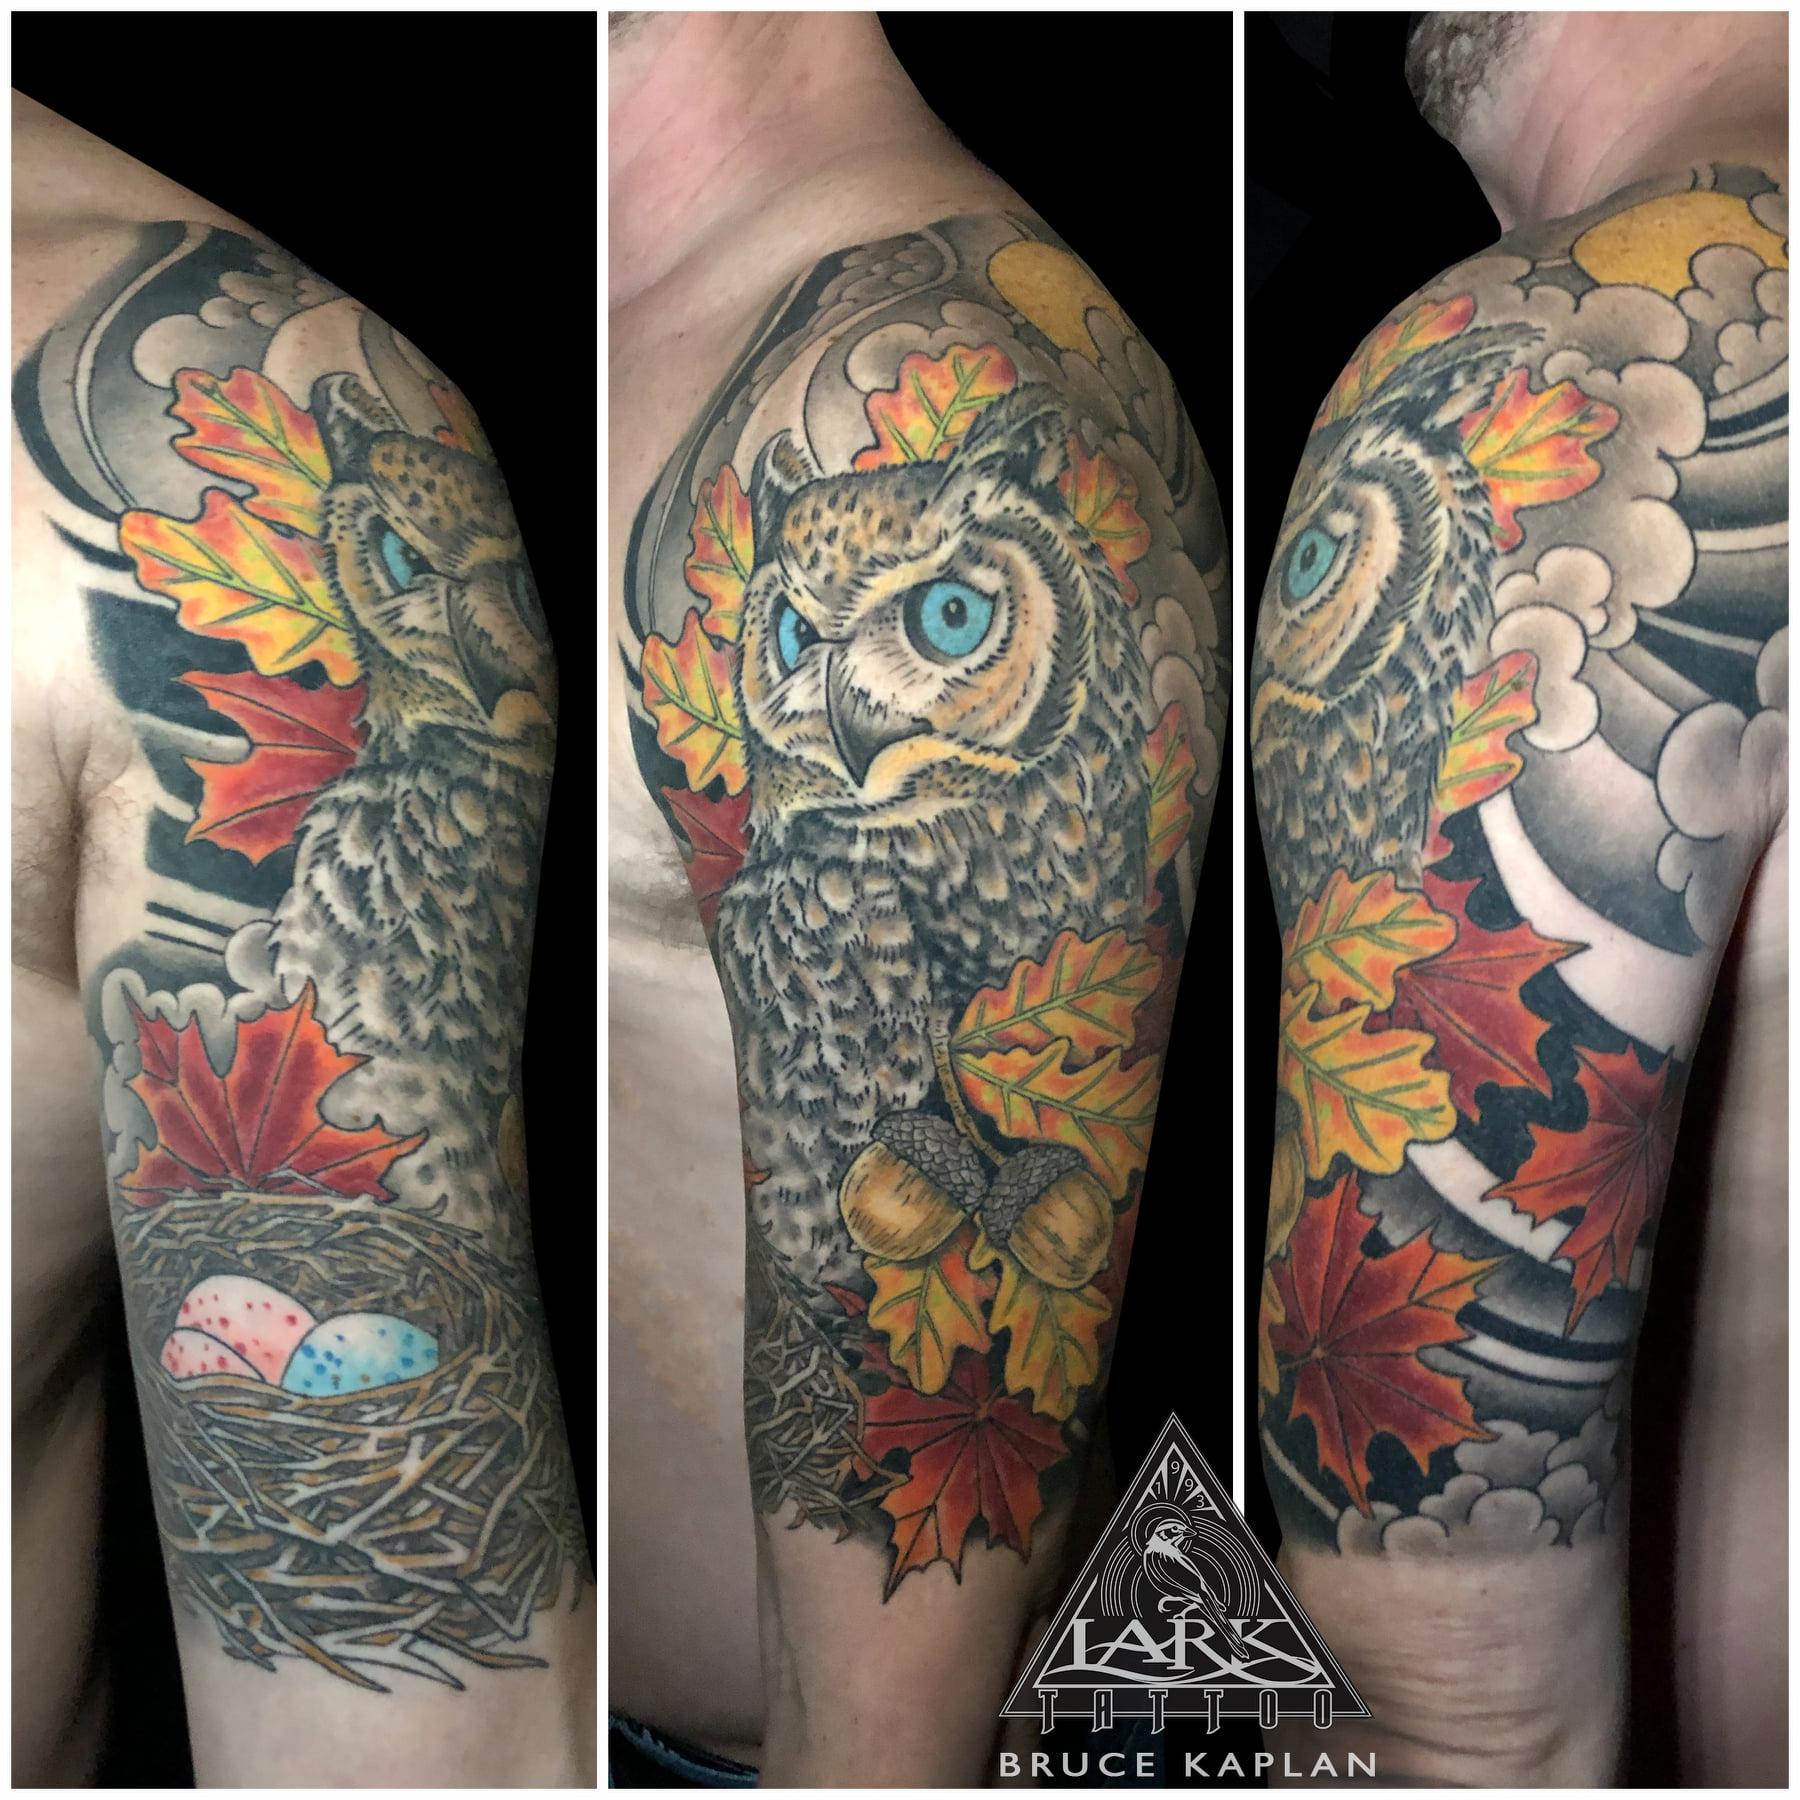 LarkTattoo, BruceKaplan, BruceKaplanLarkTattoo, Tattoo, Tattoos, Owl, OwlTattoo, Bird, BirdTattoo, HornedOwl, HornedOwlTattoo, GreatHornedOwl, OwlsOfInstagram, BirdOfPrey, BirdOfPreyTattoo, Nature, NatureTattoo, ColorTattoo, HalfSleeve, HalfSleeveTattoo, TattooArtist, Tattoist, Tattooer, LongIslandTattooArtist, LongIslandTattooer, LongIslandTattoo, TattooOfTheDay, Tat, Tats, Tatts, Tatted, Inked, Ink, TattooInk, AmazingInk, AmazingTattoo, BodyArt, LarkTattooWestbury, Westbury, LongIsland, NY, NewYork, USA, Art, Tattedup, InkedUp, LarkTattoos